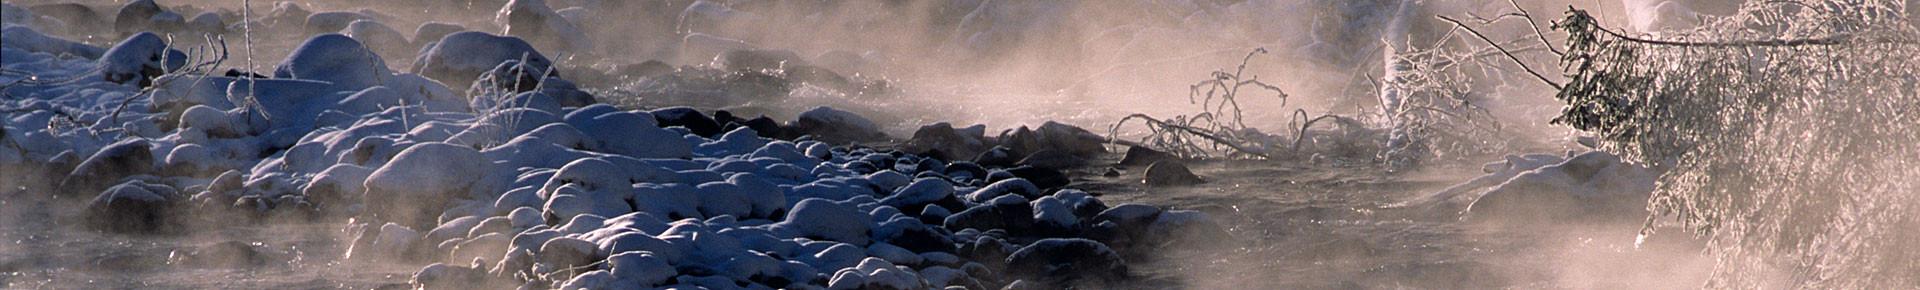 Les bords de Dranse en hiver